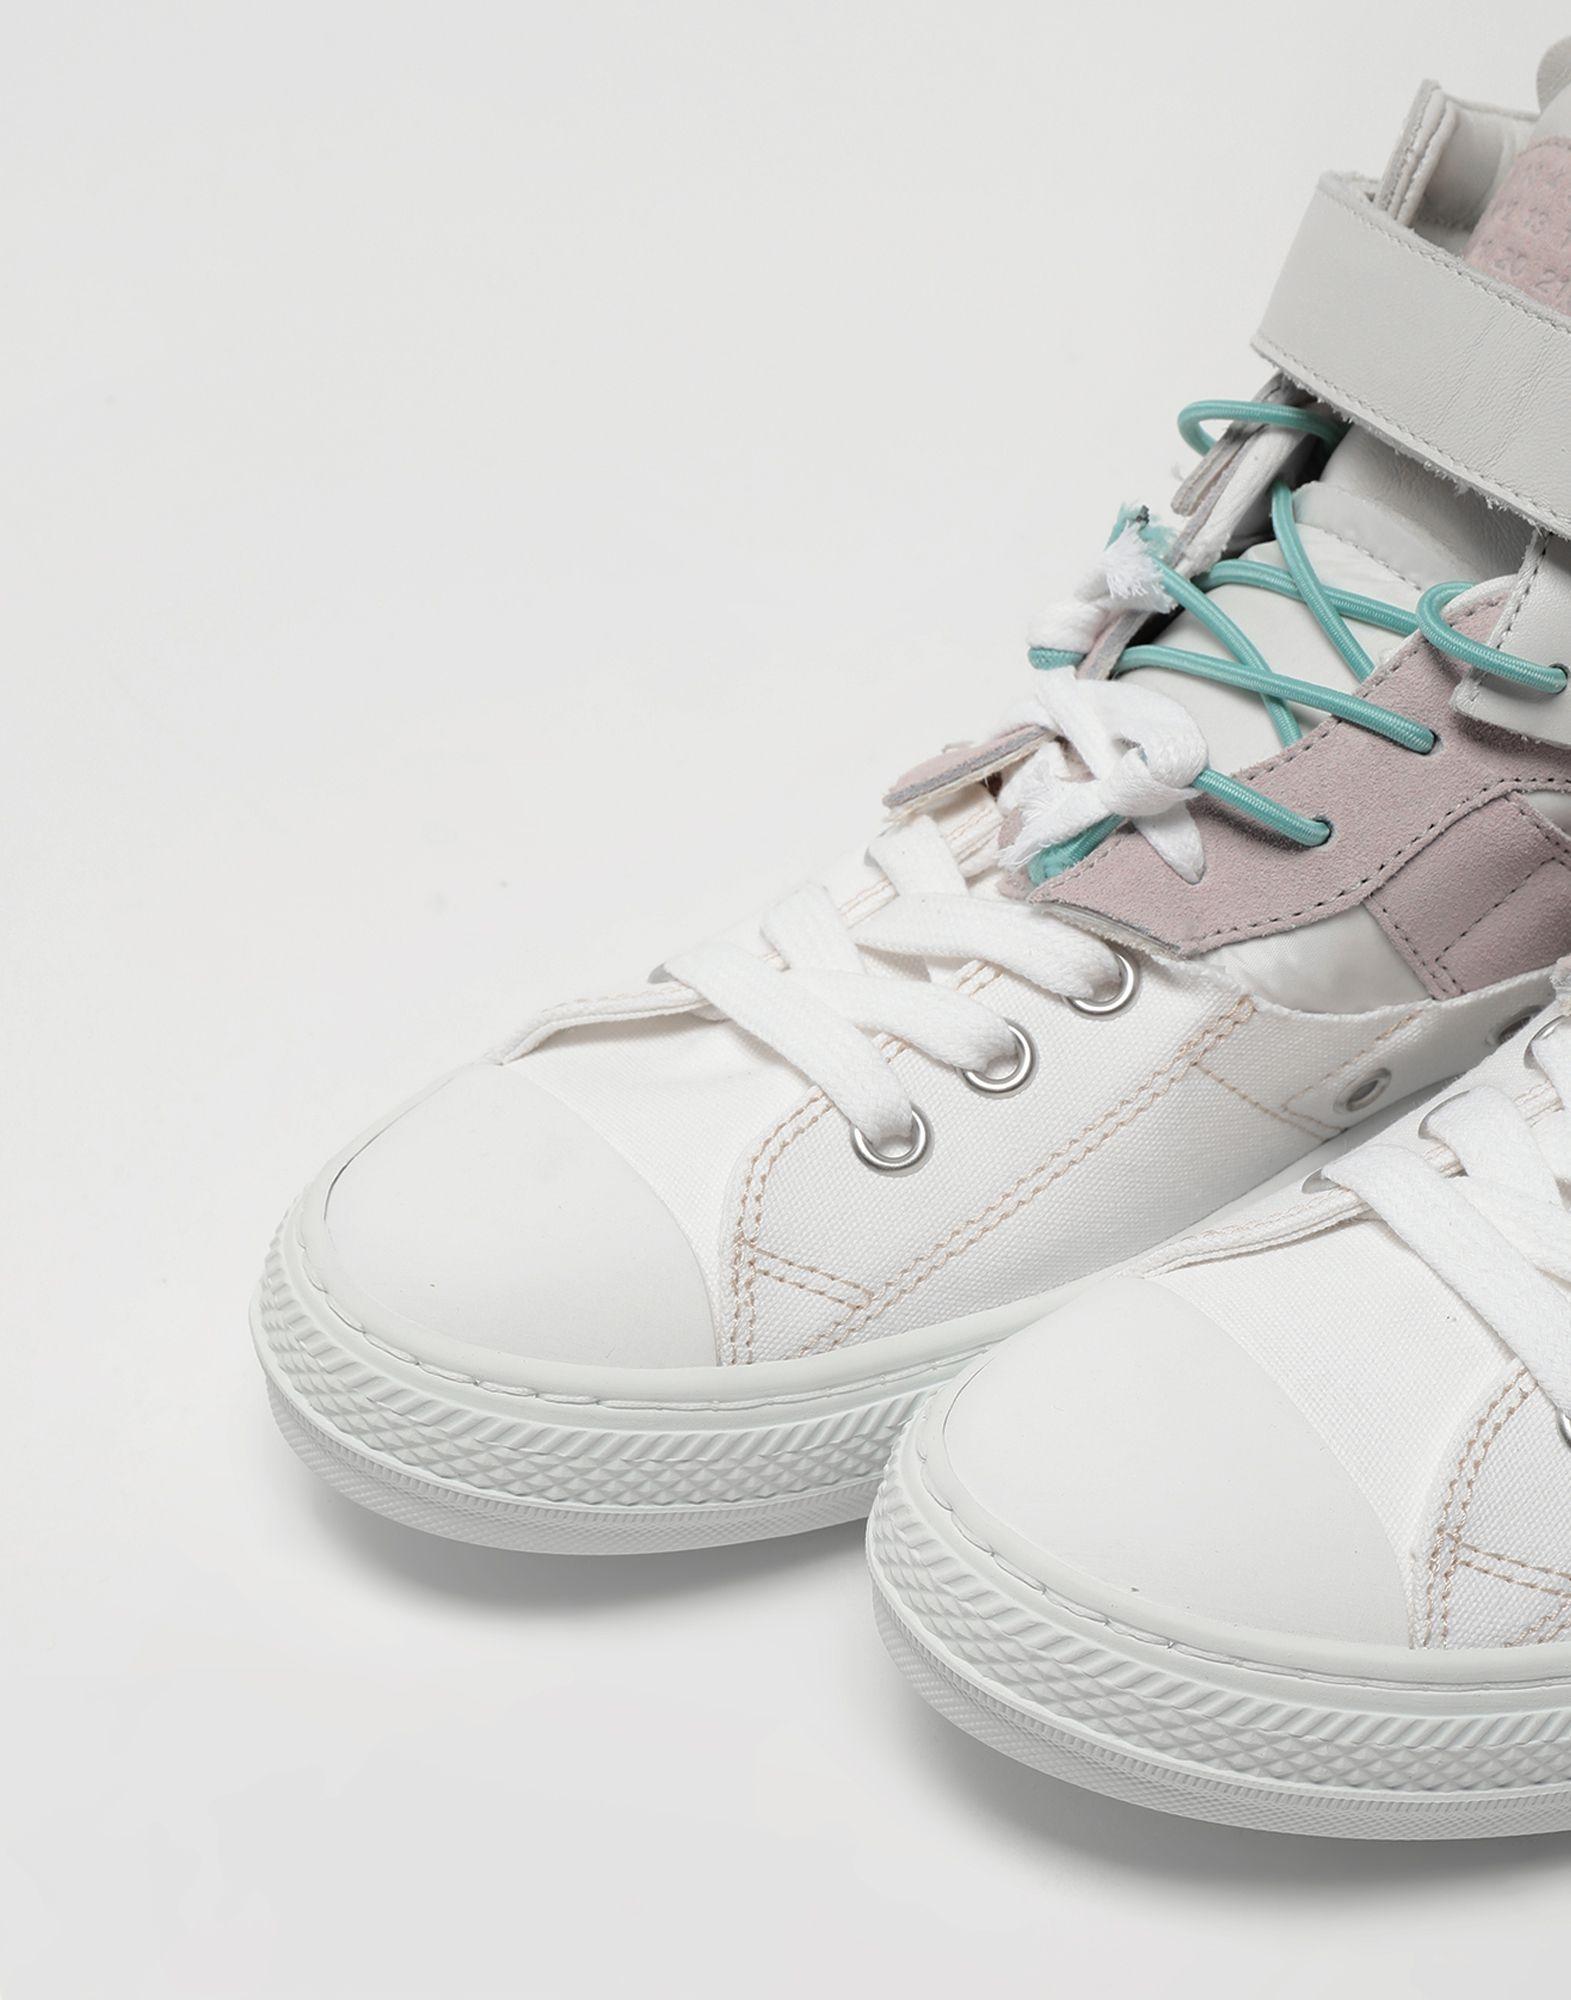 MAISON MARGIELA Sneakers montantes Spliced Sneakers Homme e